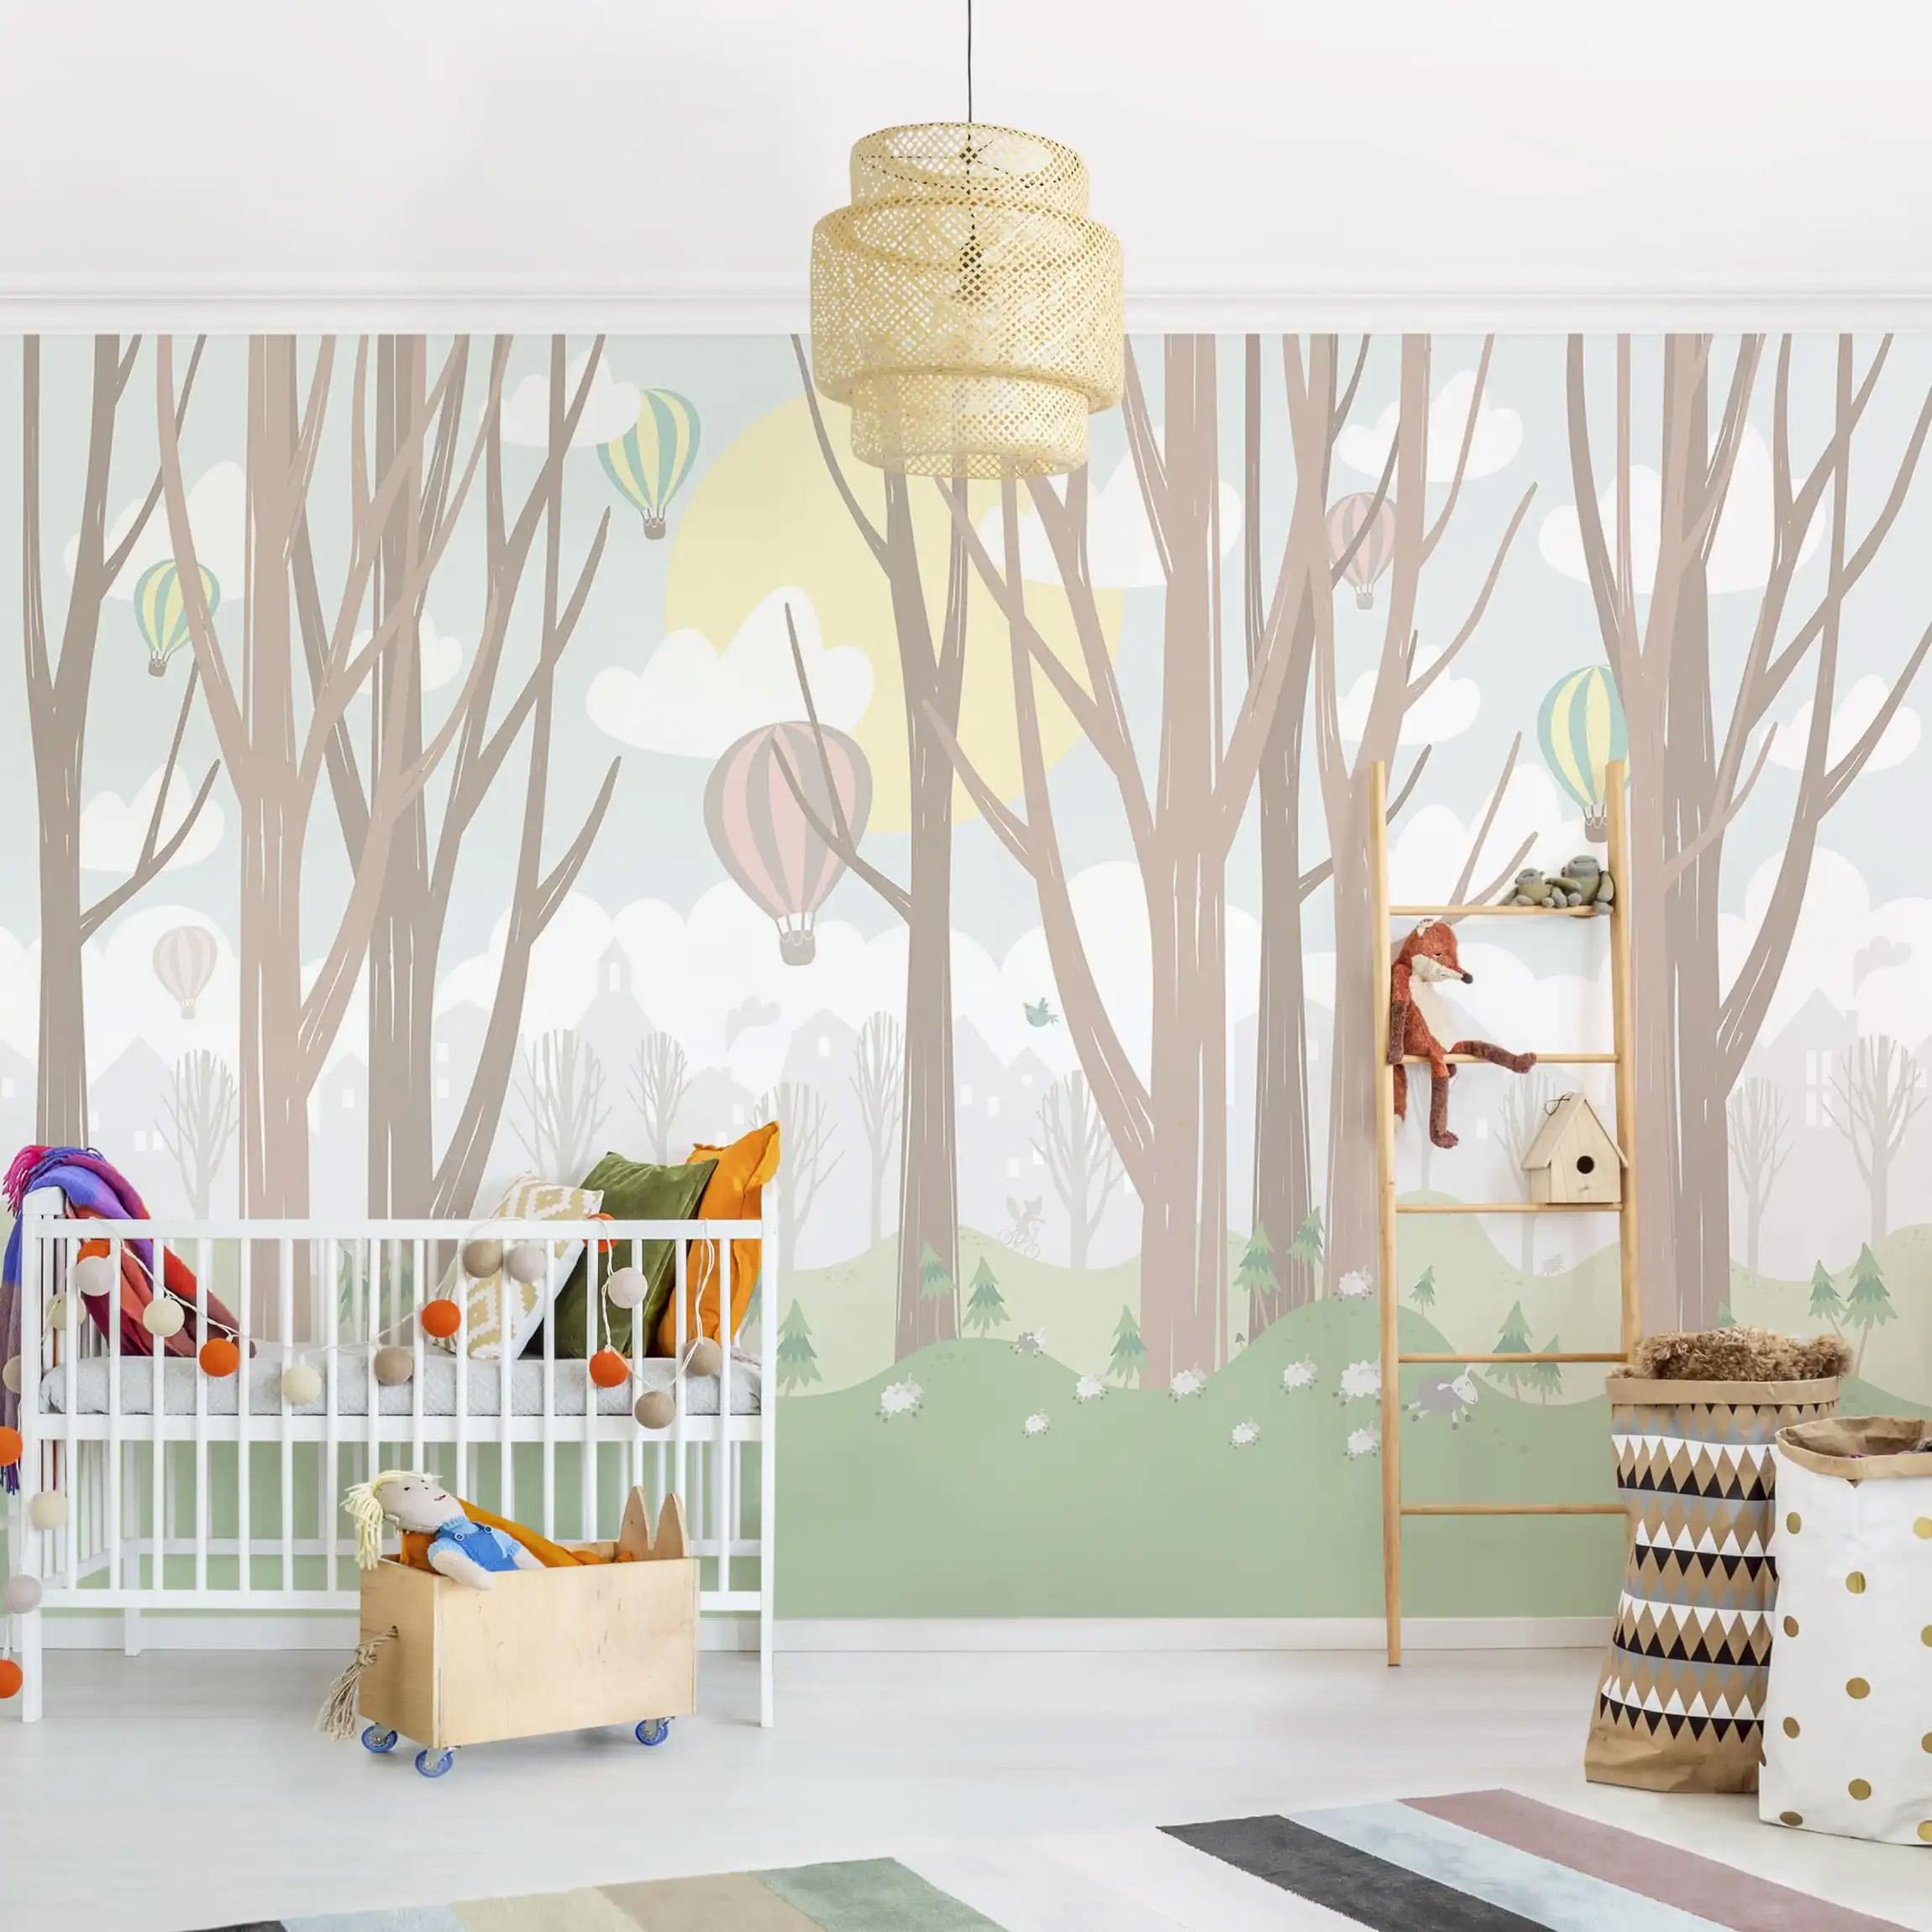 Fototapete Kinderzimmer